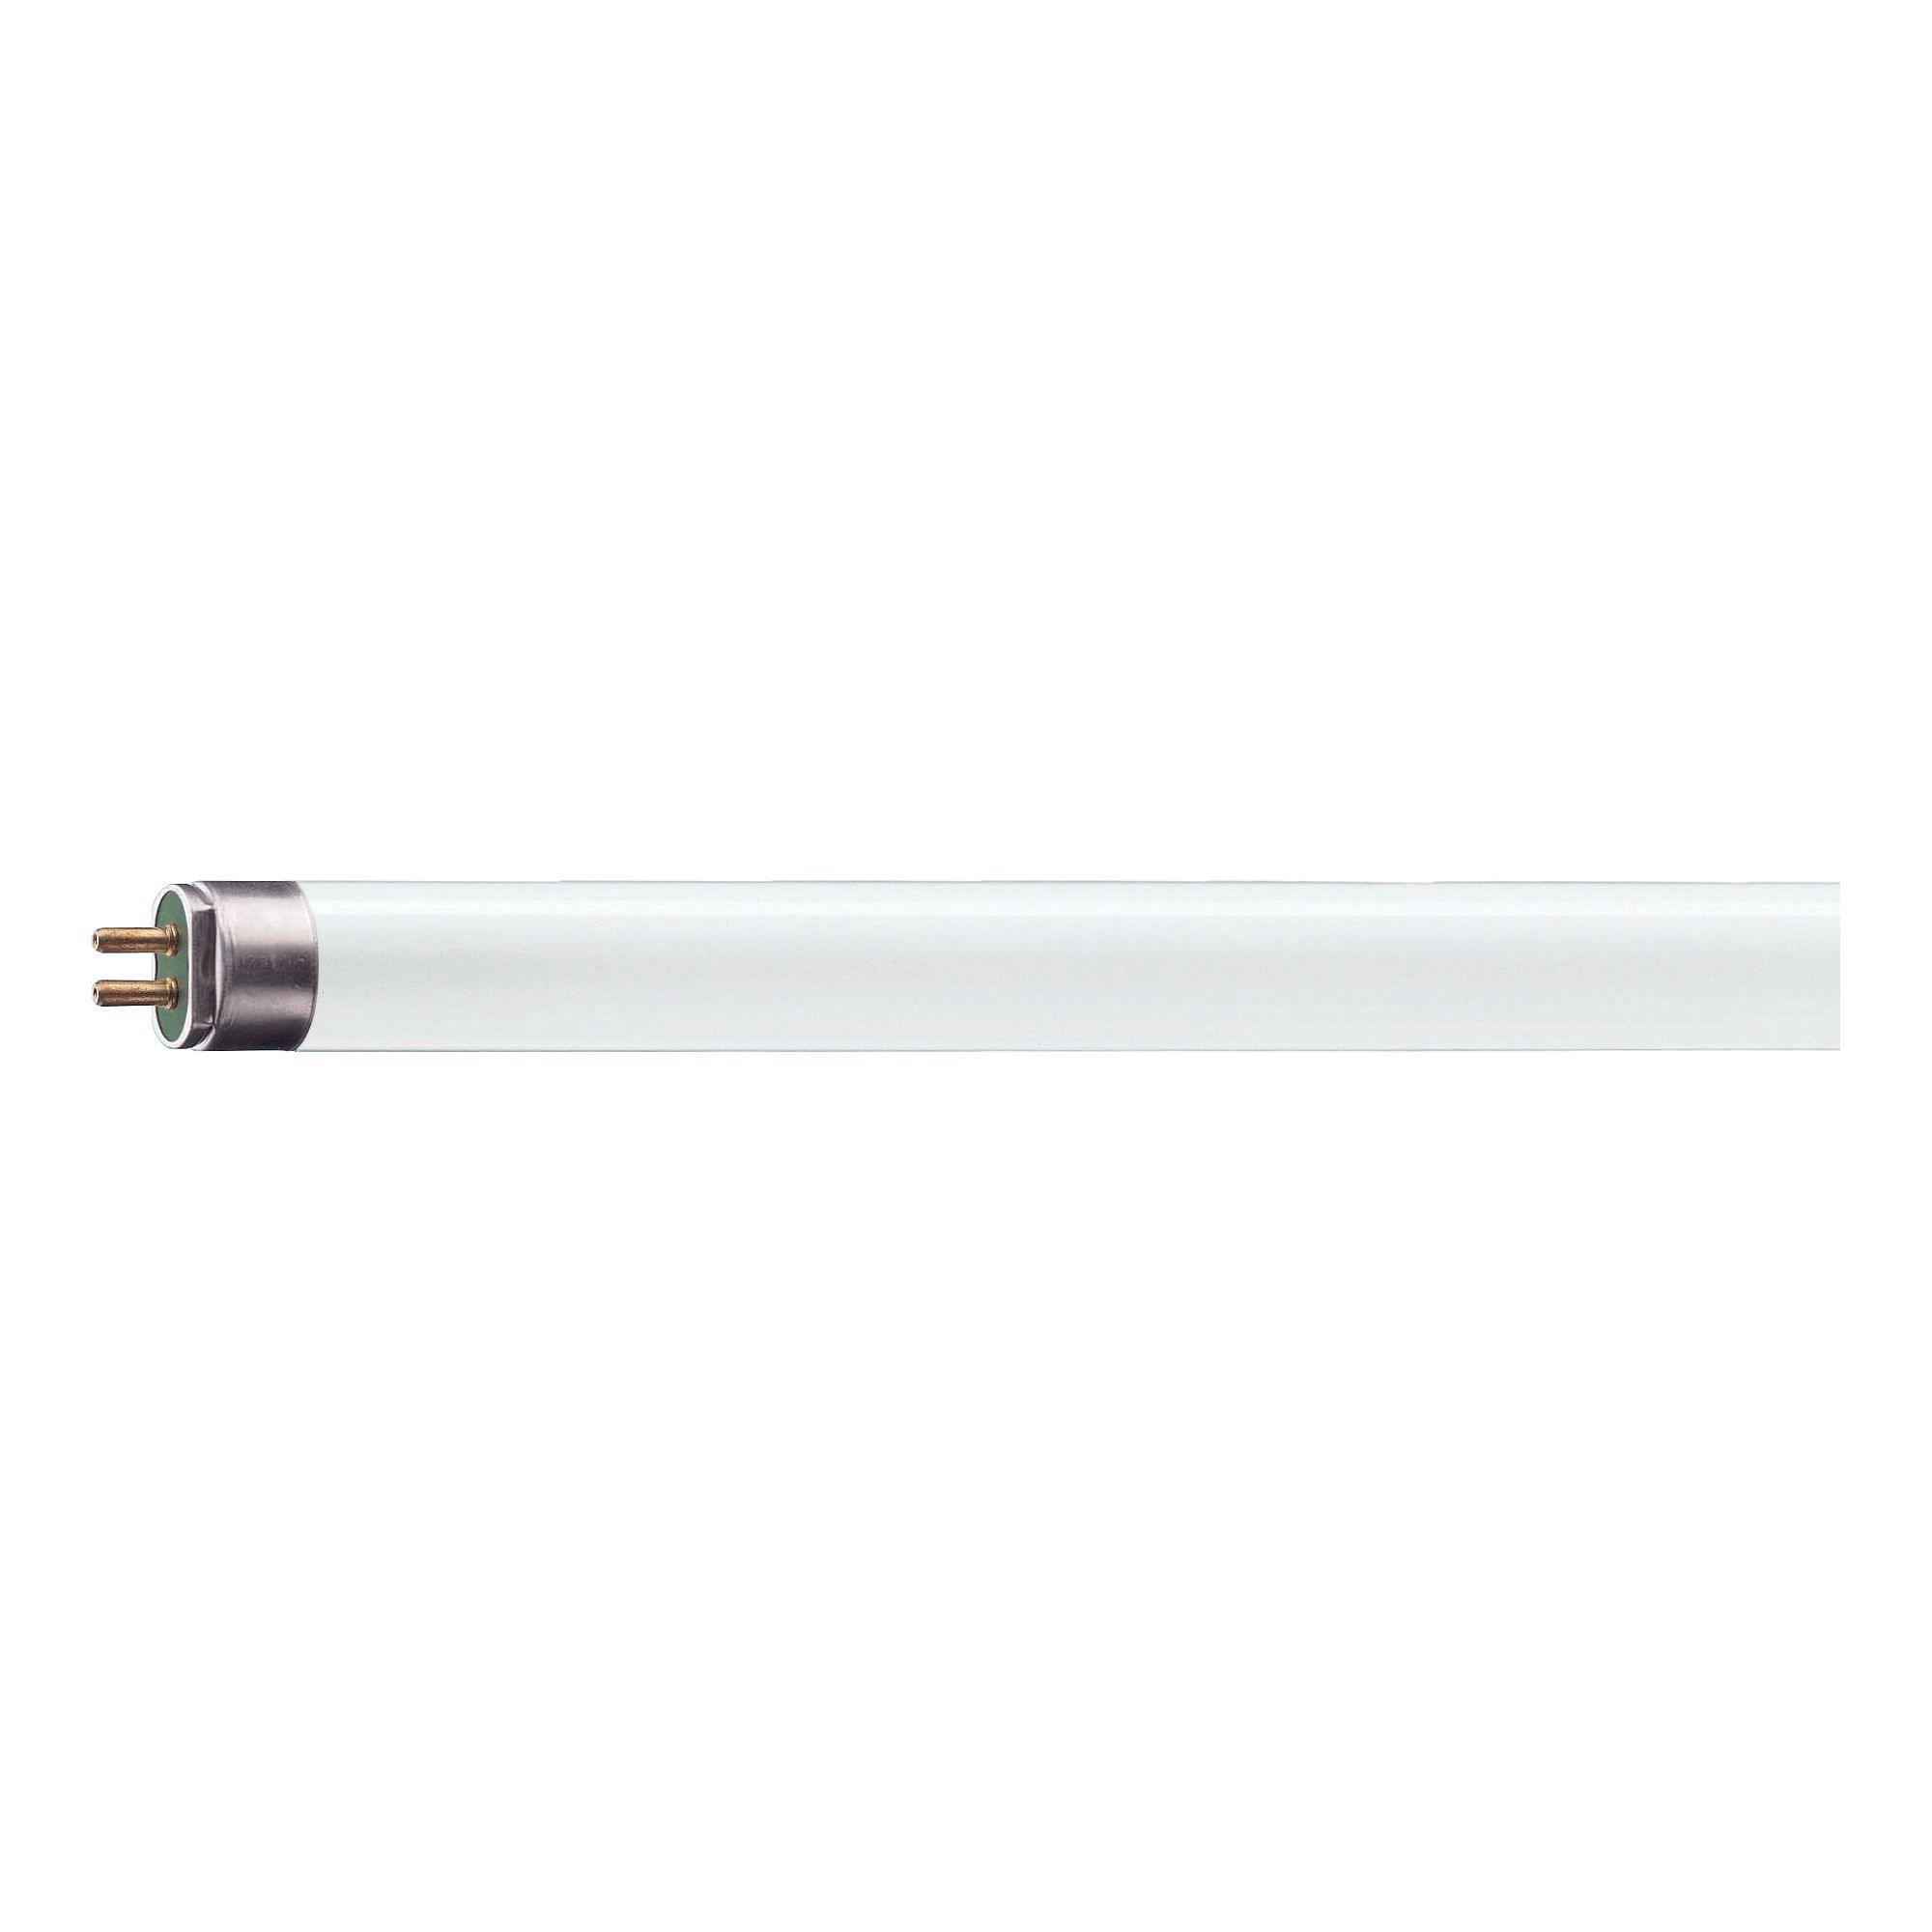 Купить Лампа люминесцентная Philips Master TL5 HE 28W/840 SLV/40 1163мм 28Вт d16 G5 ней